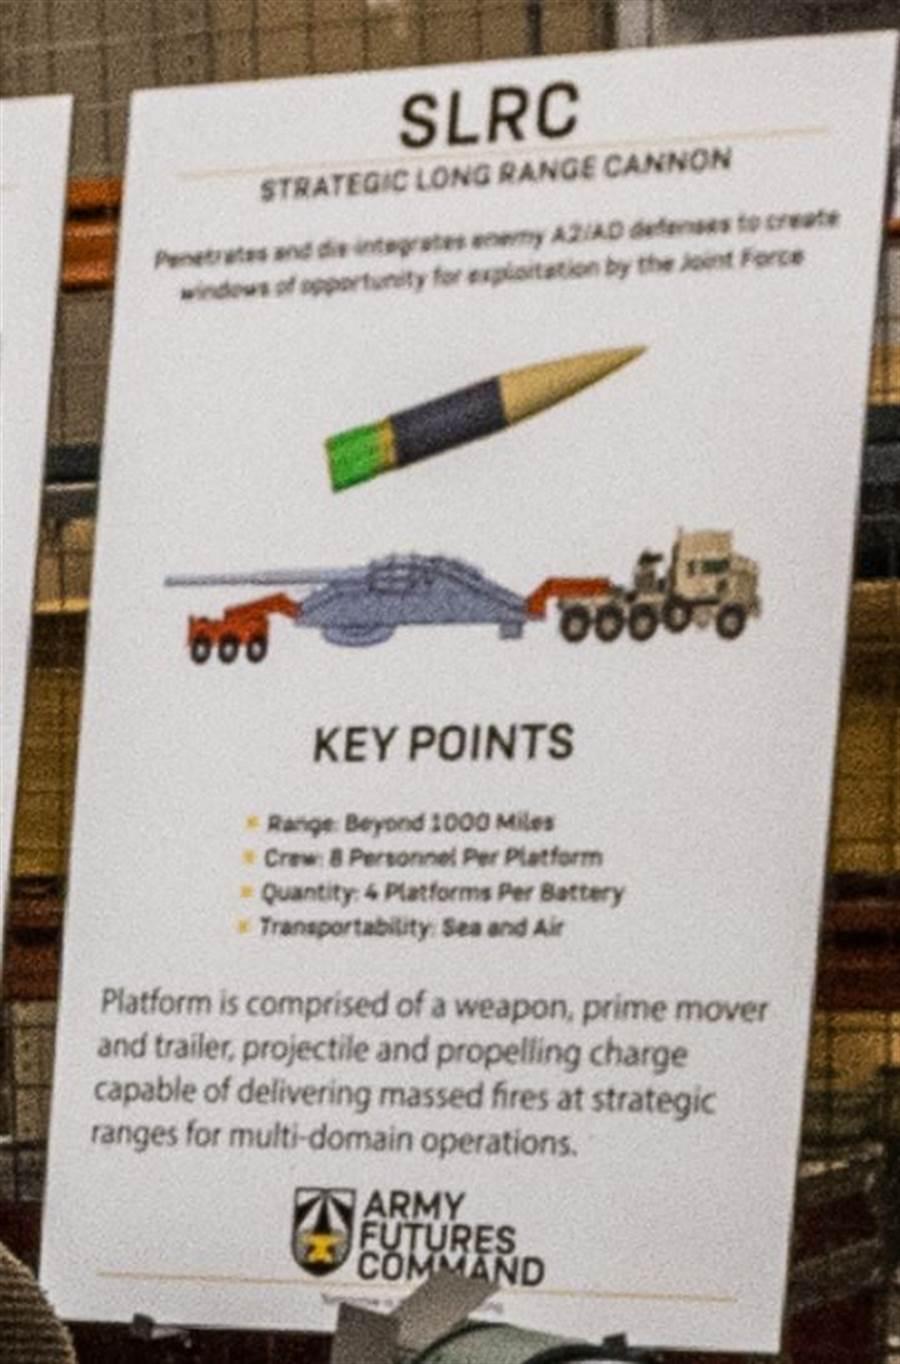 SLAC大砲的說明板,大砲體積巨大,需要前拖車和後引車來一起搬運。(圖/笑臉男人)